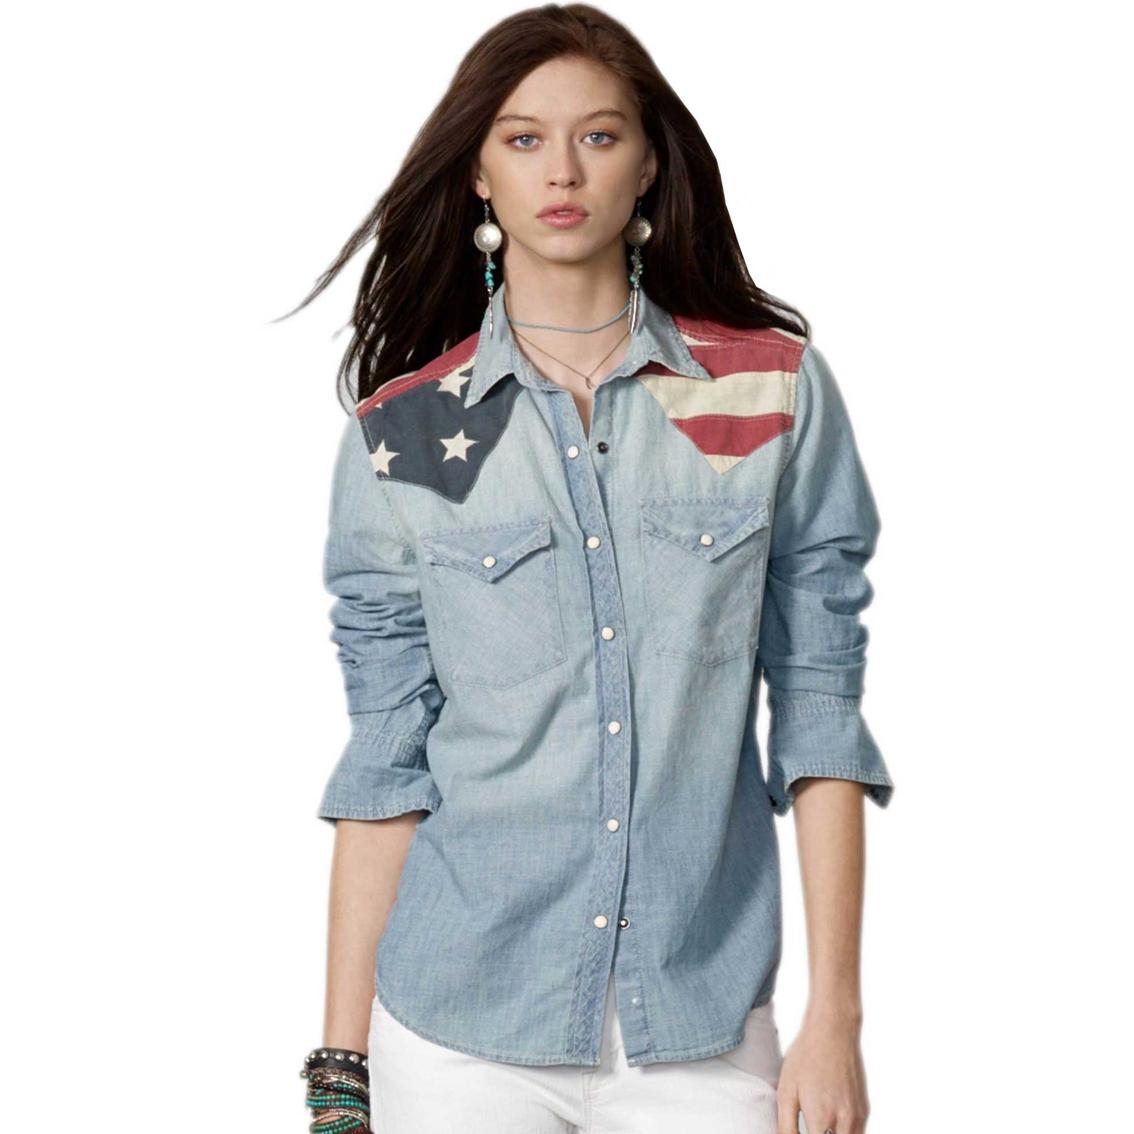 Womens American Flag Shirt